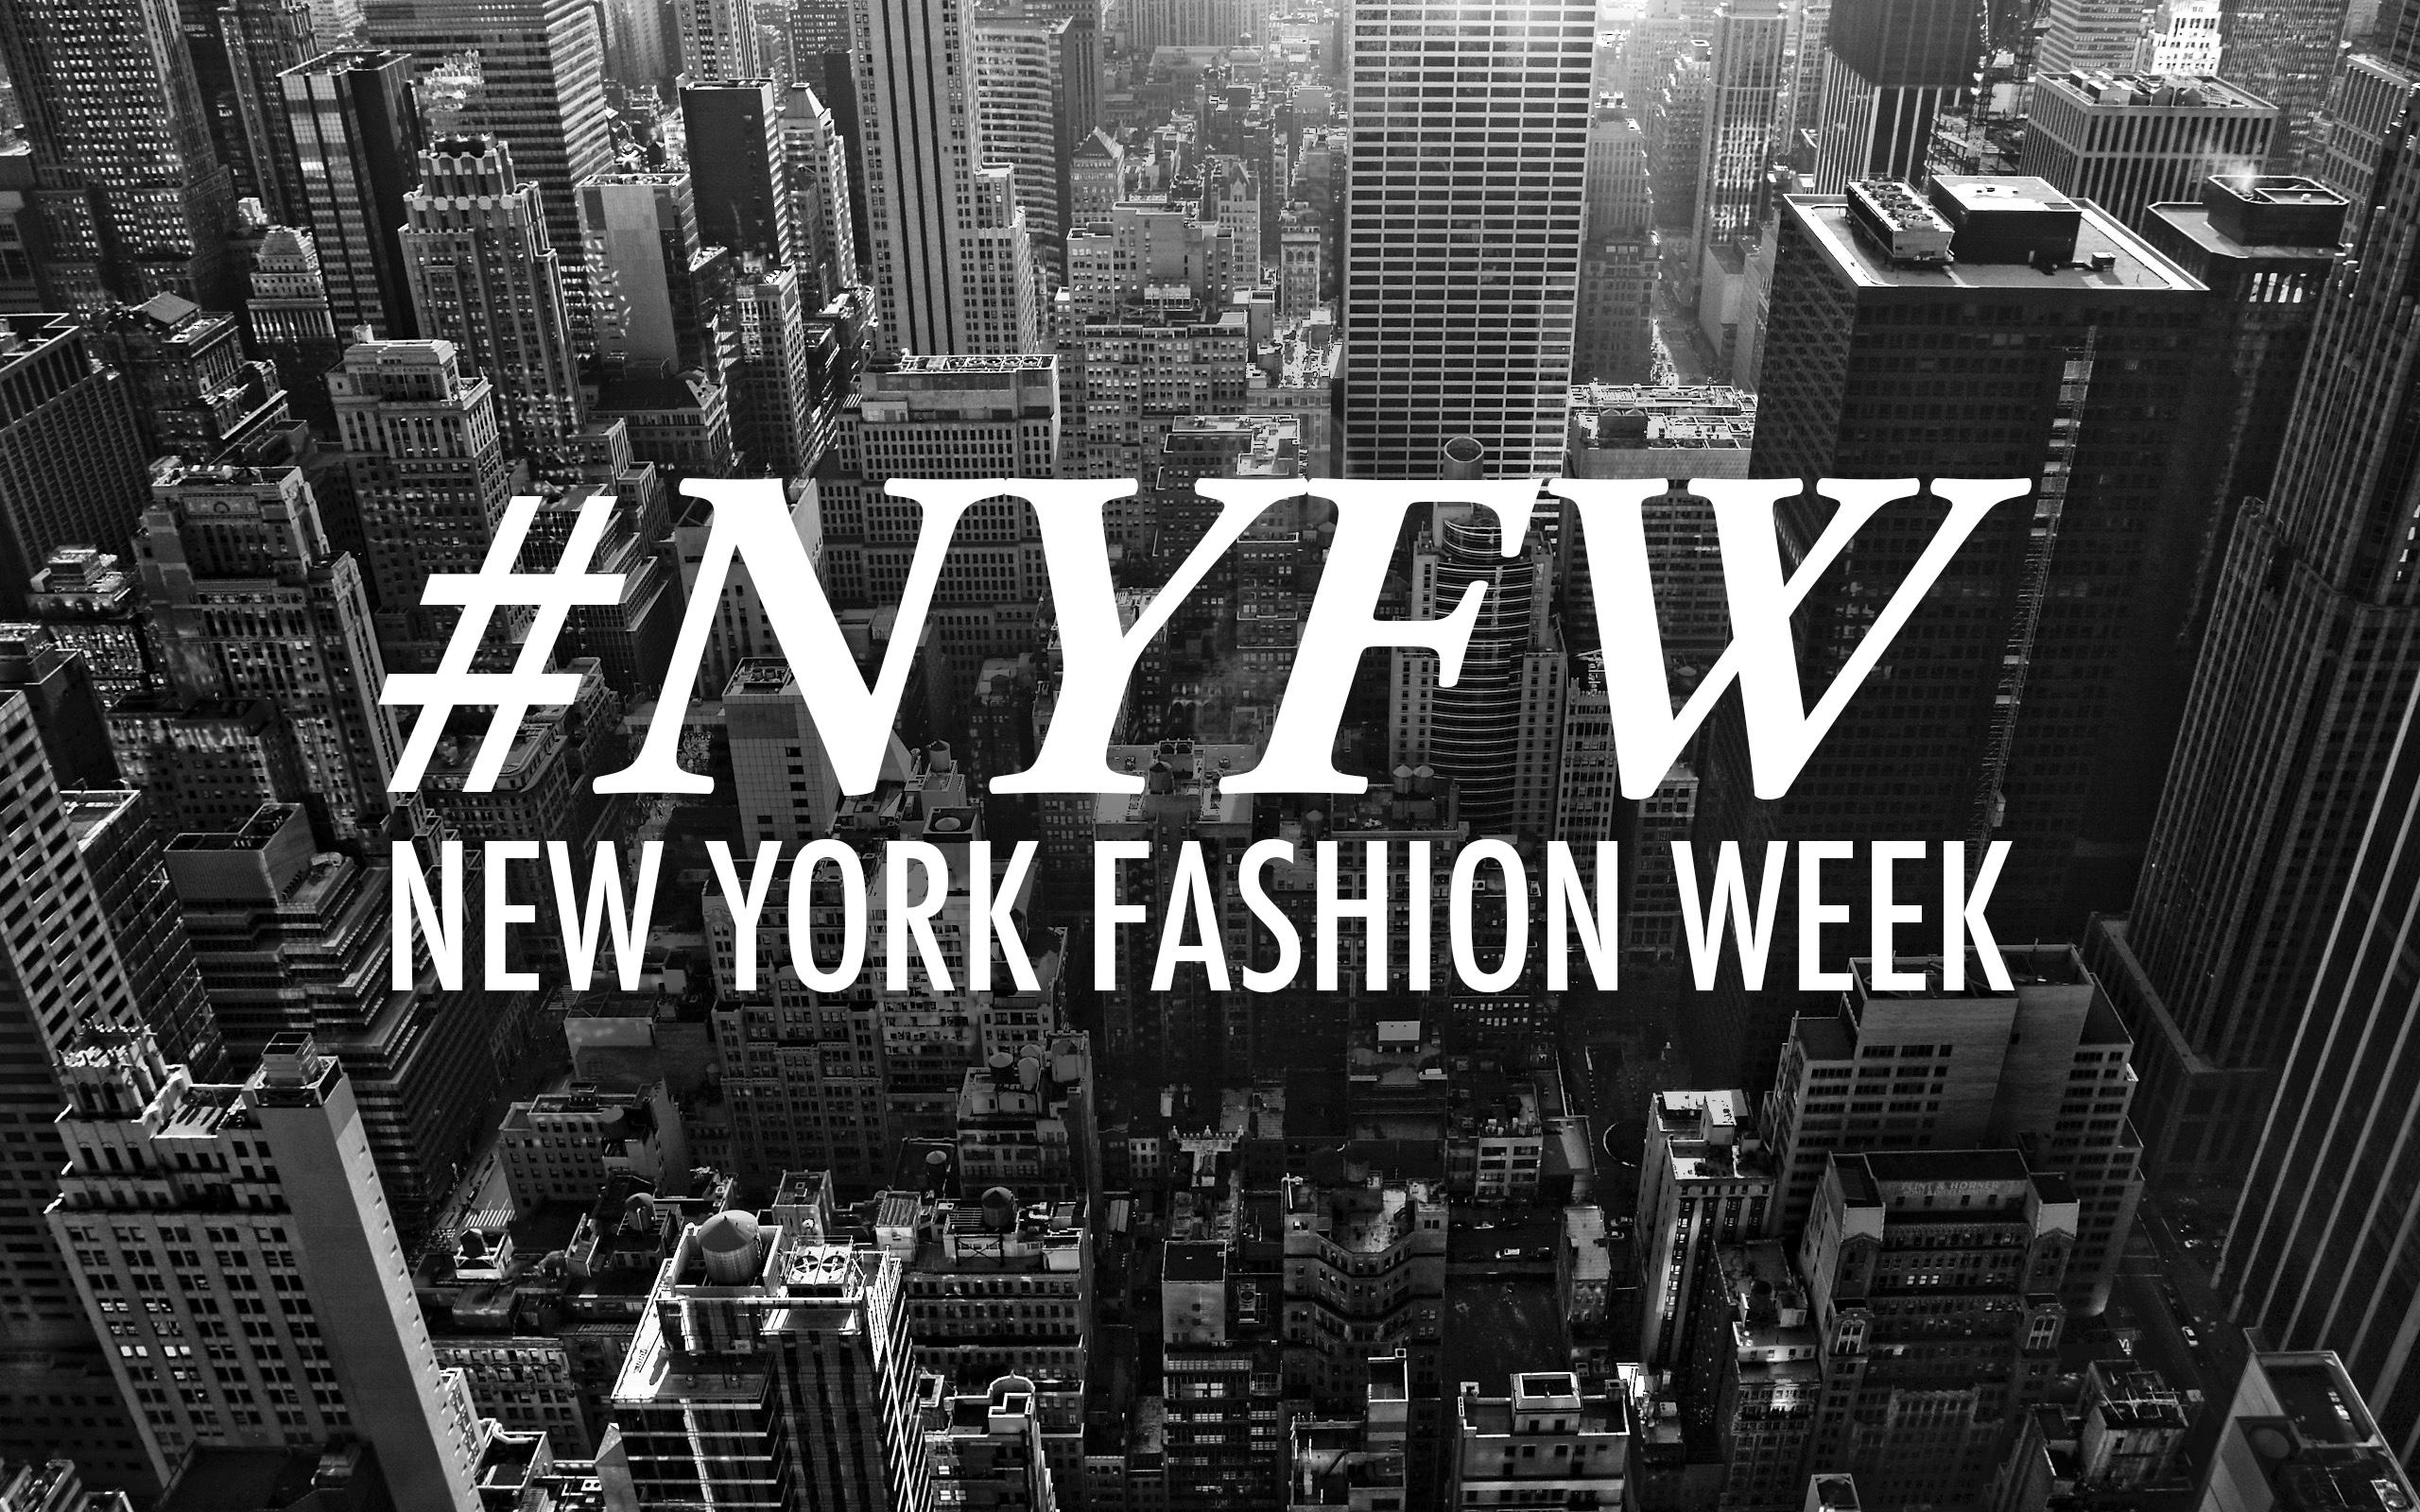 ¡Damos comienzo al New York Fashion Week Primavera/Verano 2016!